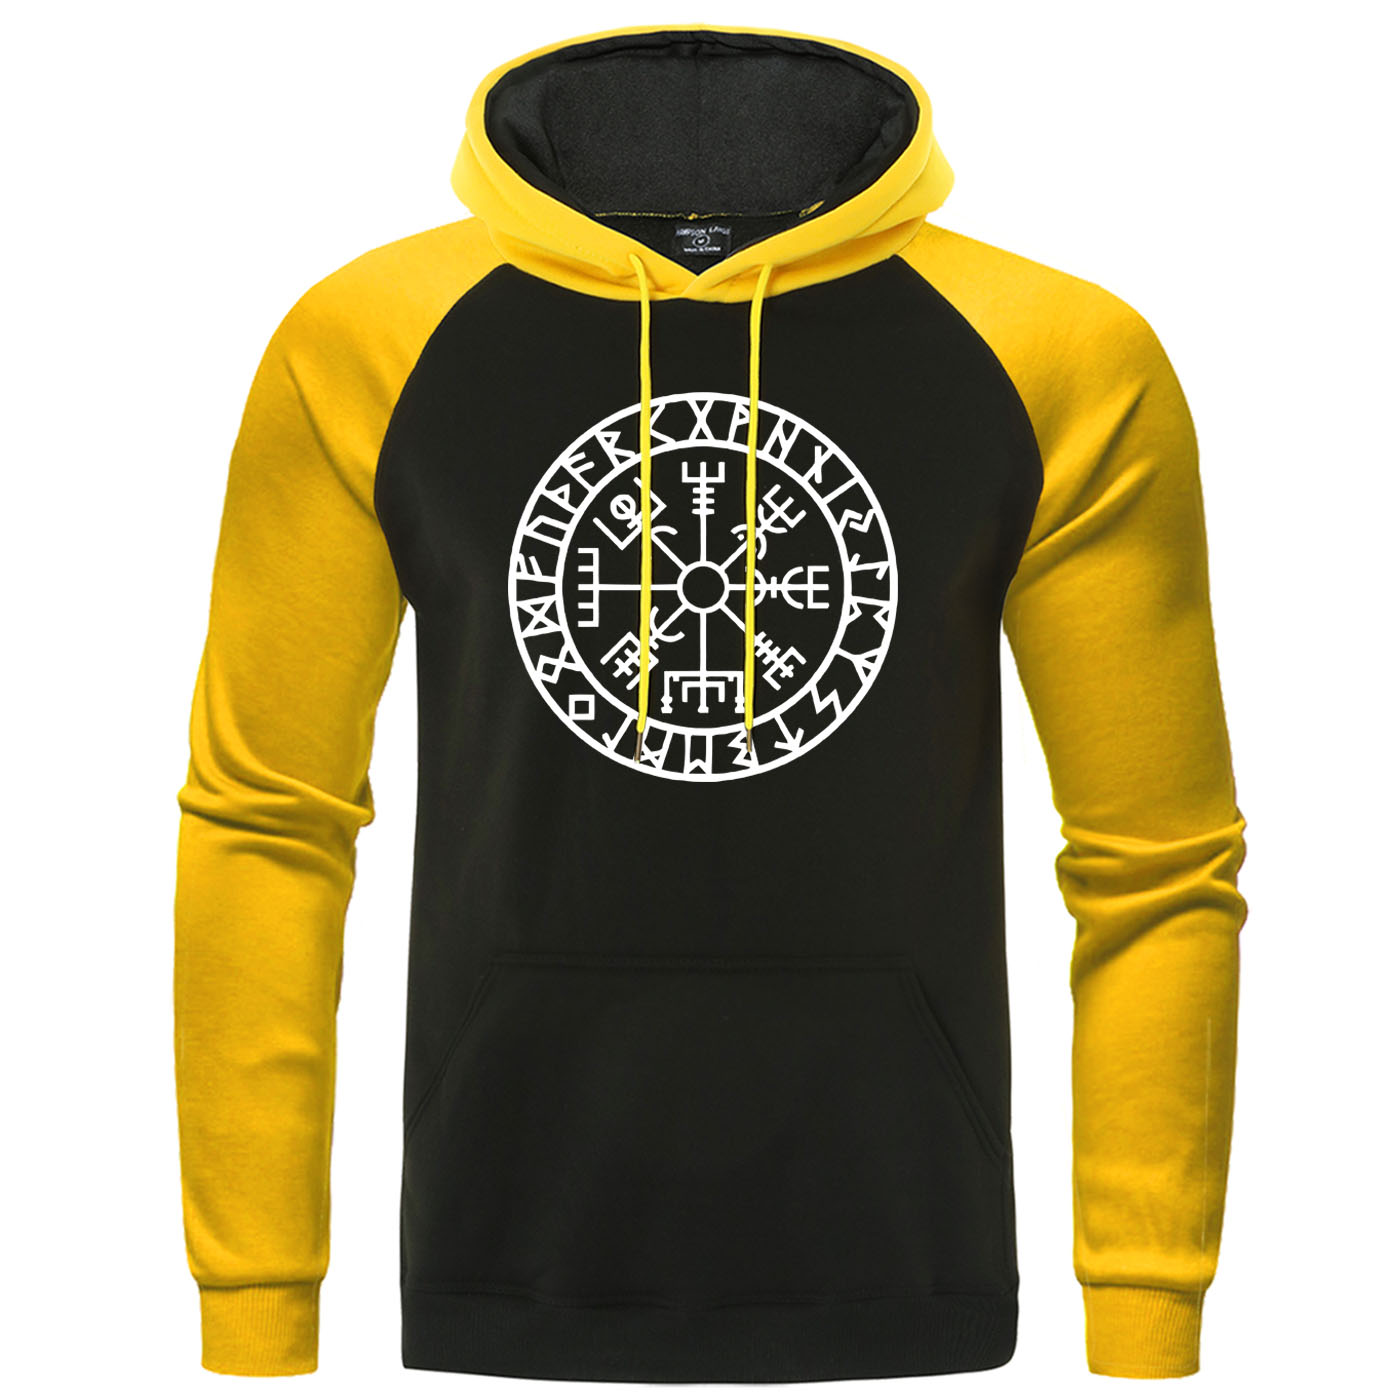 Mens New Sweatshirt Sweater Crew Neck Pullover Fish Print Jumper Fleece Warm